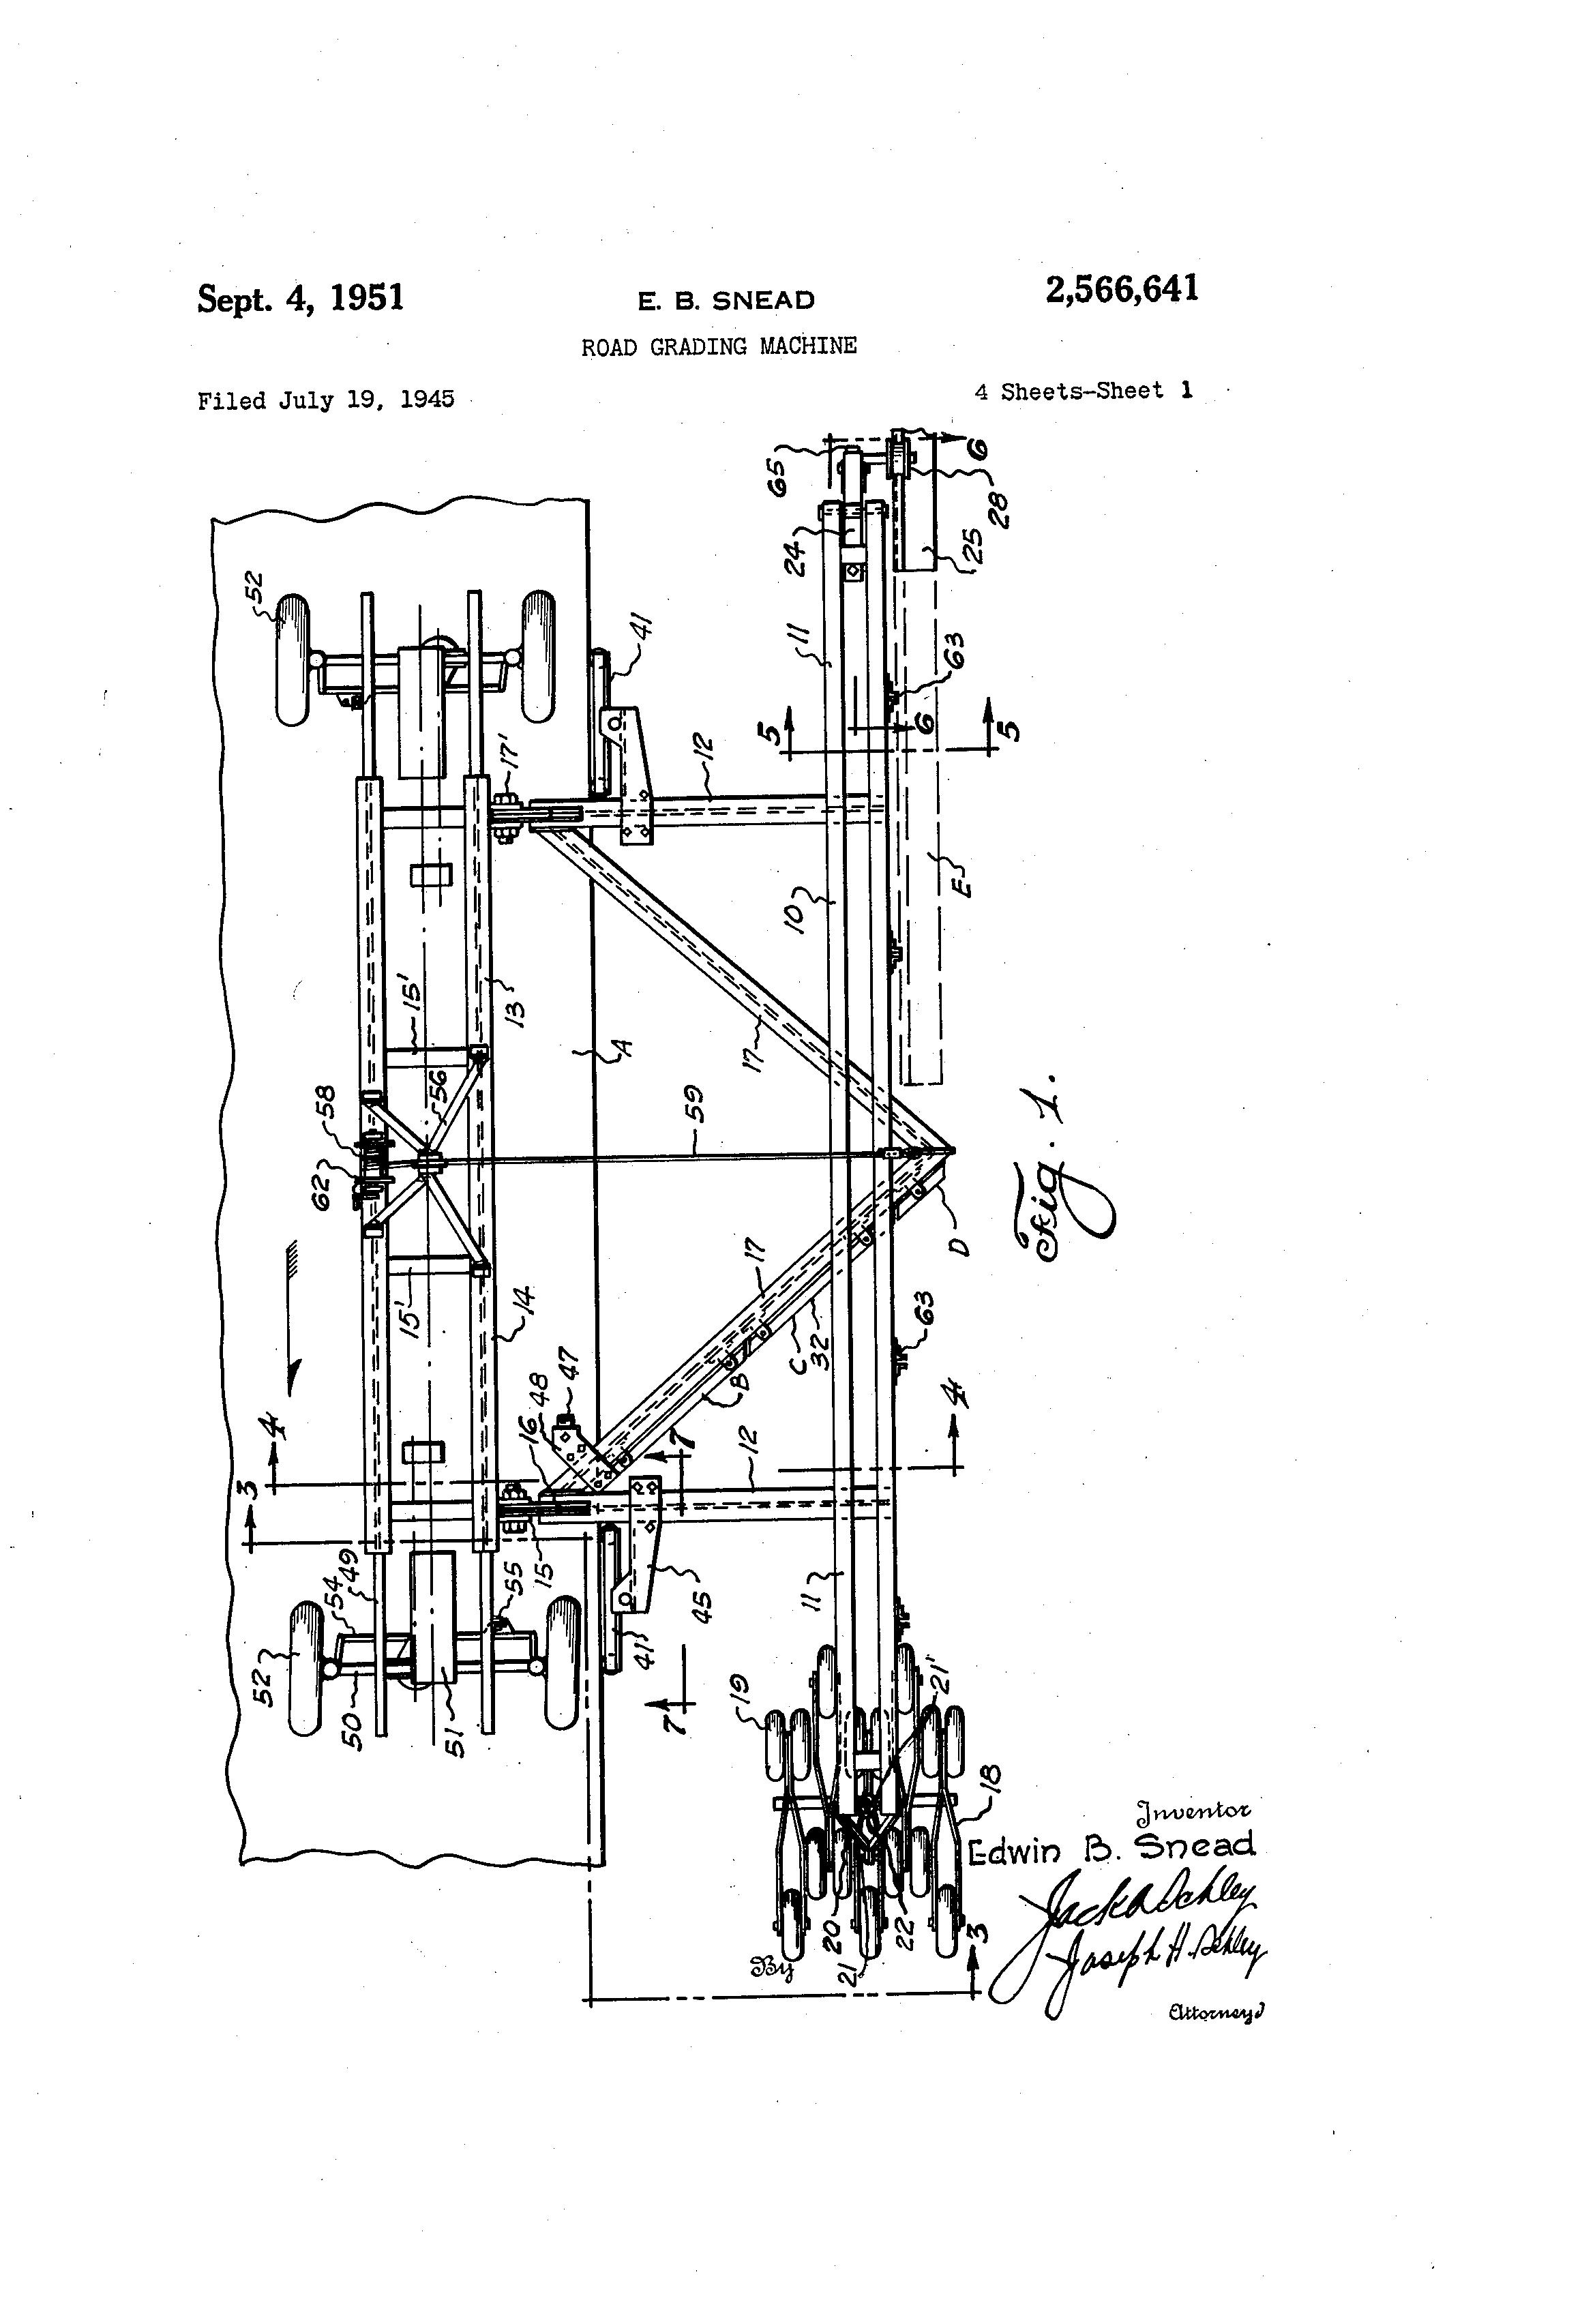 road grading machine